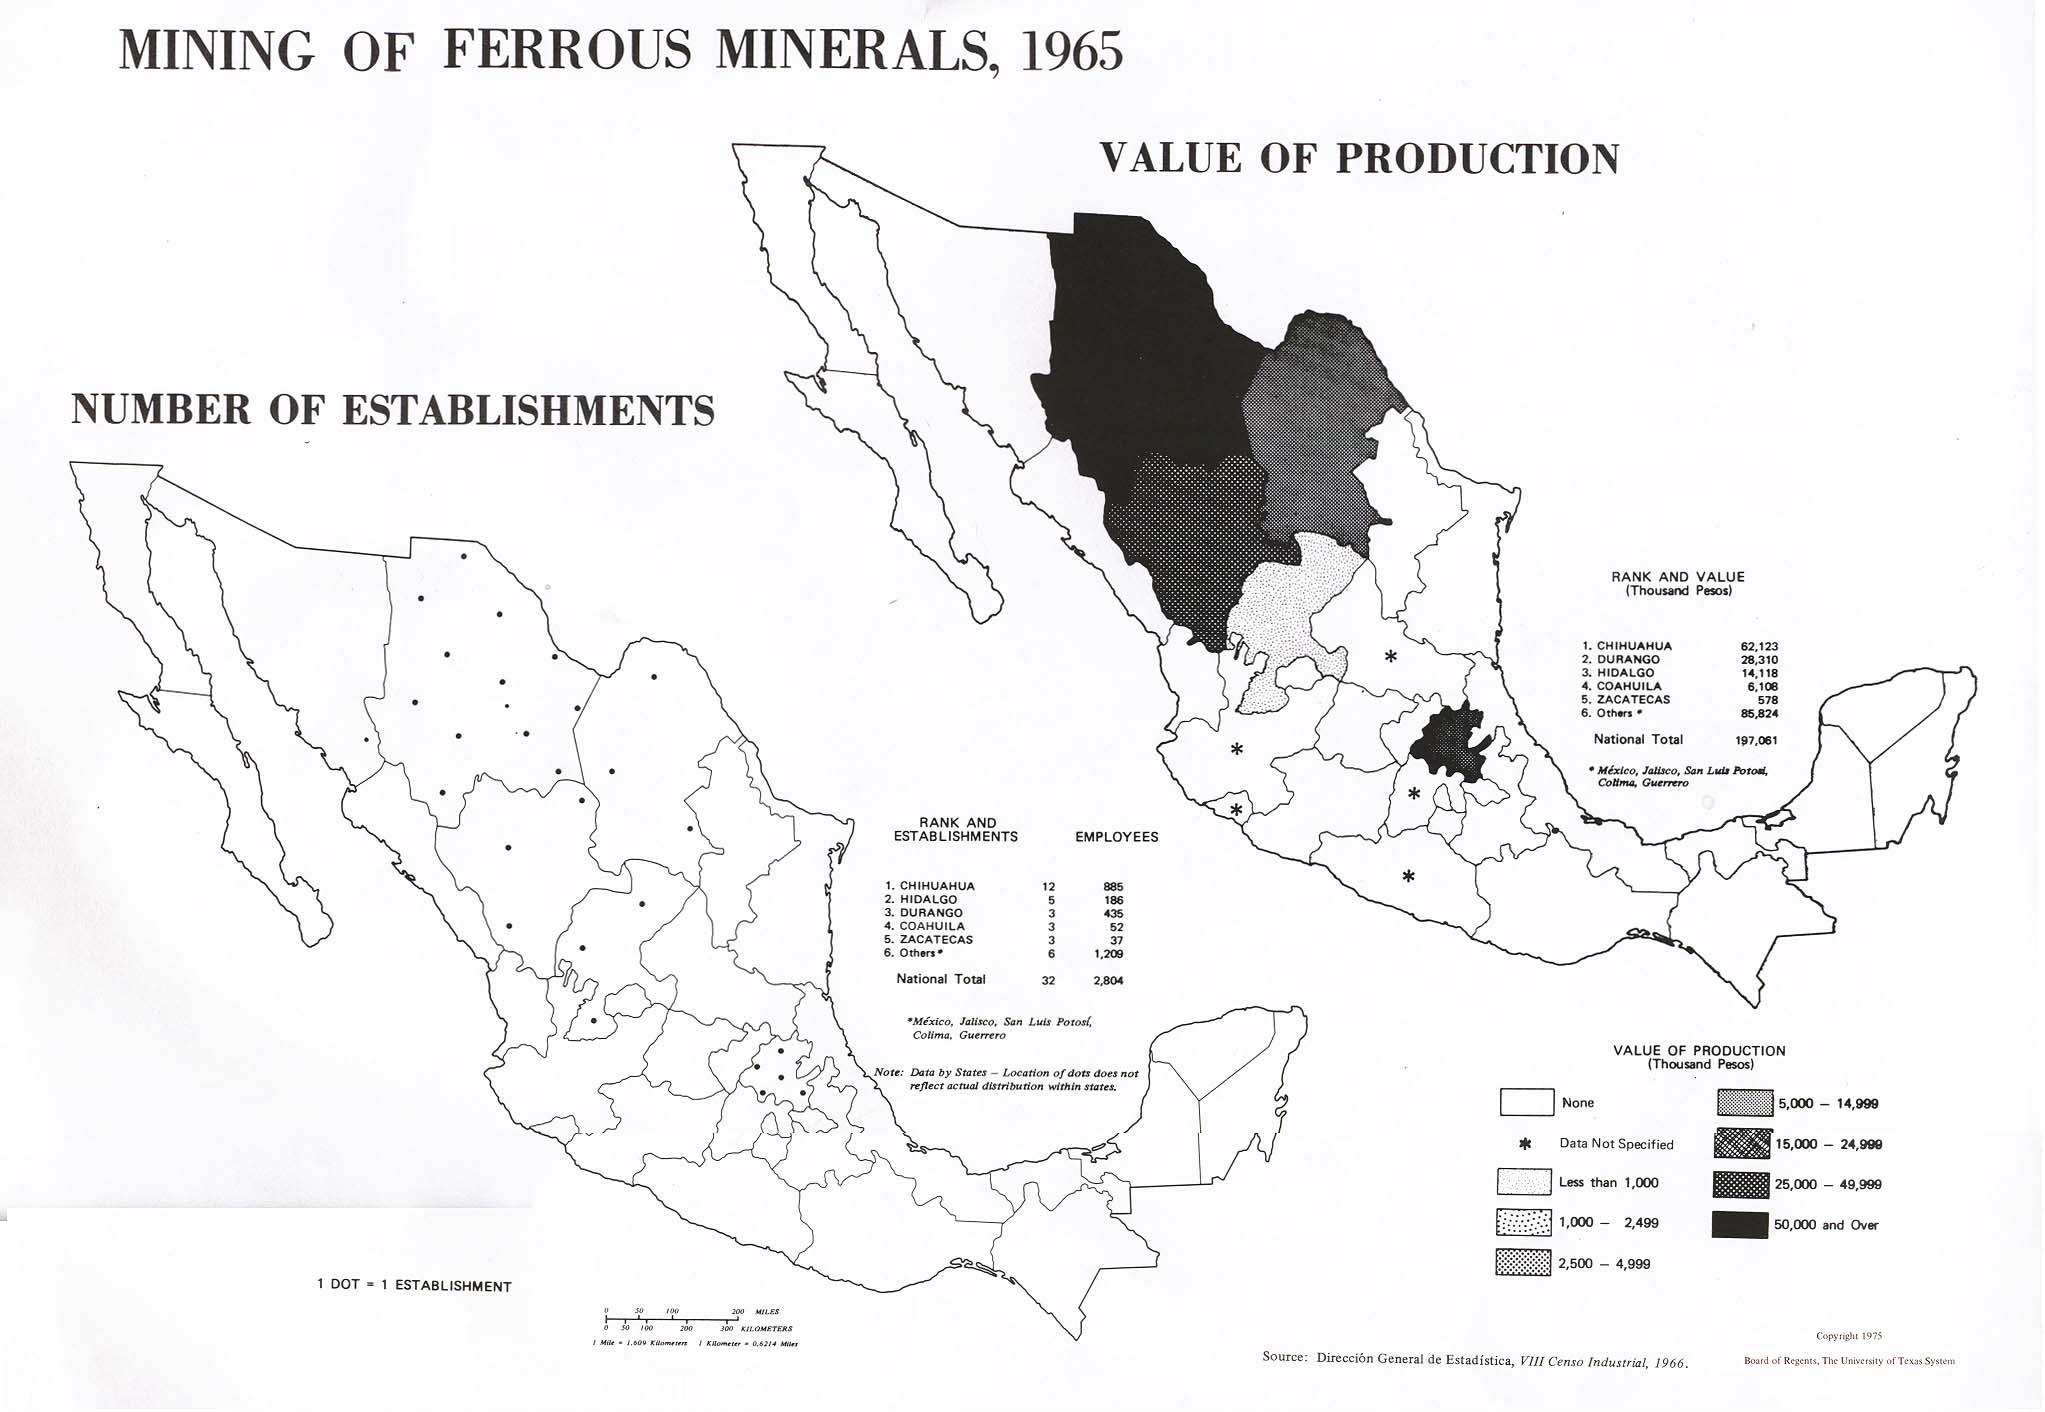 Mapa de Miner�a de Minerales Met�licos no Ferrosos en M�xico 1965